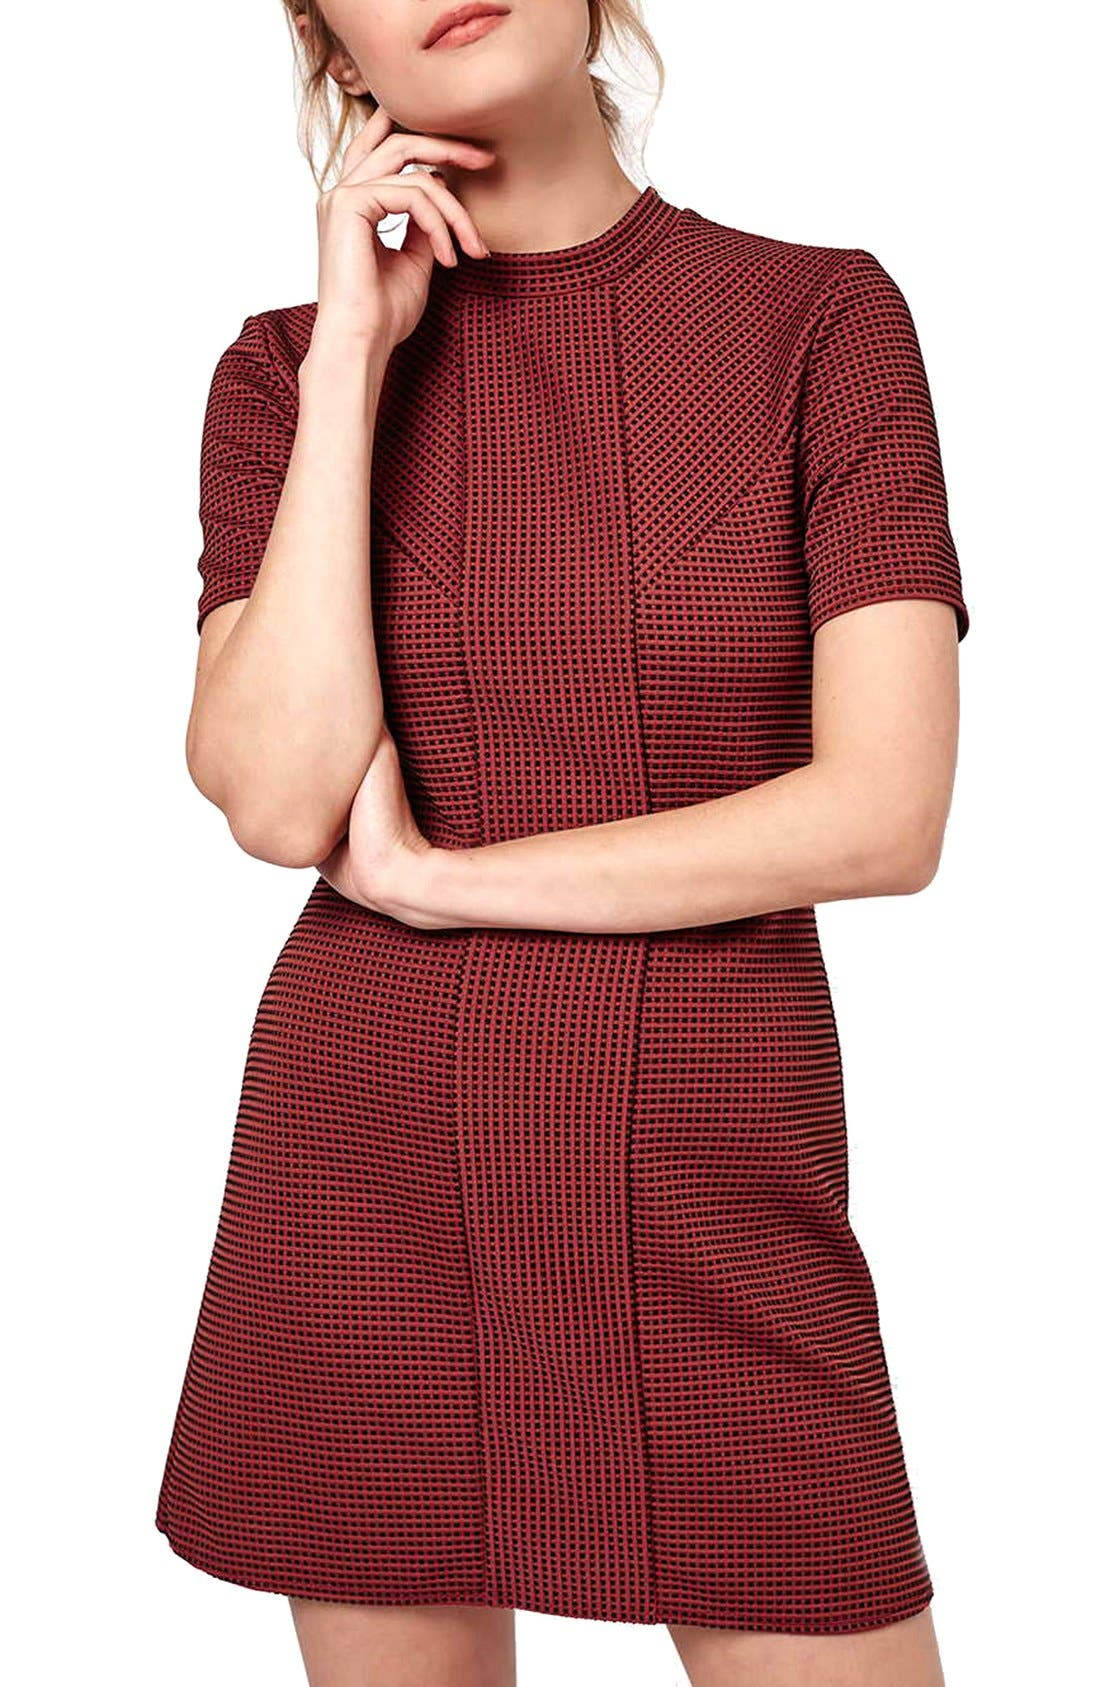 Alternate Image 1 Selected - Topshop Paneled A-Line Dress (Petite)